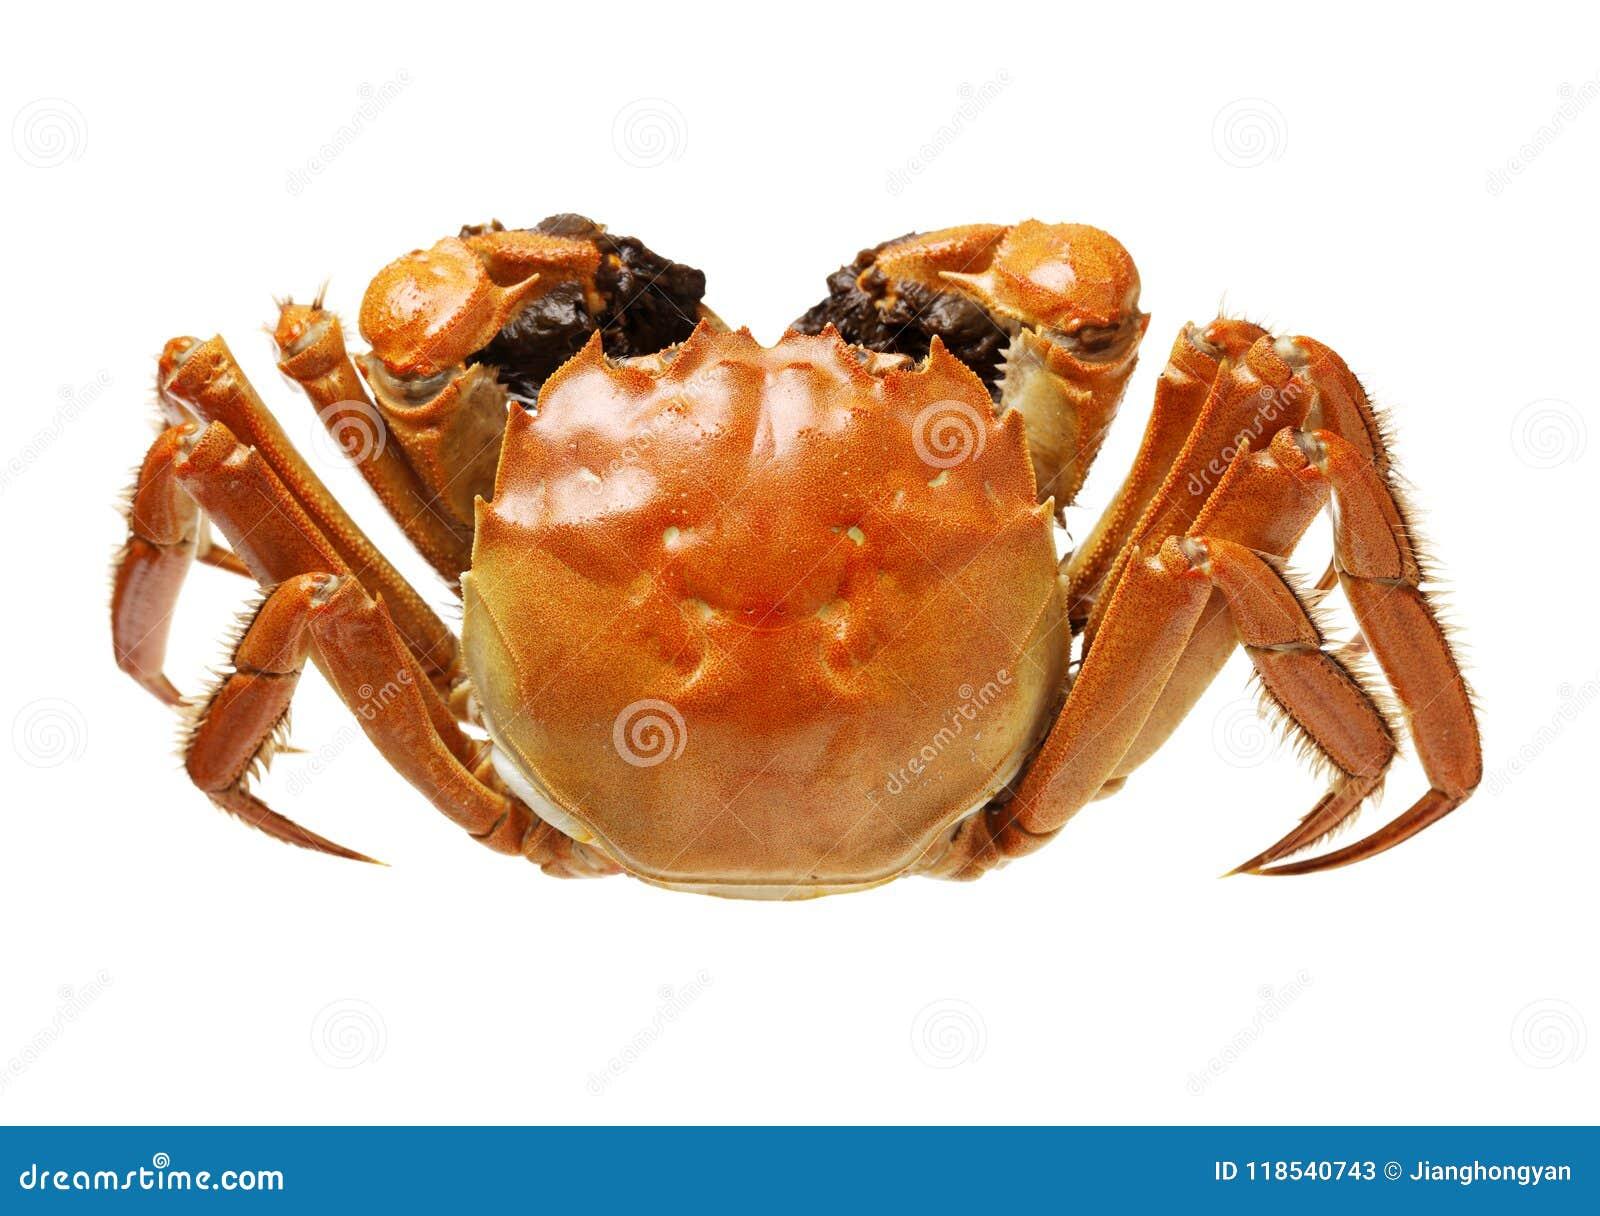 Cocido al vapor de los cangrejos melenudos de Shangai al vapor, cocina china